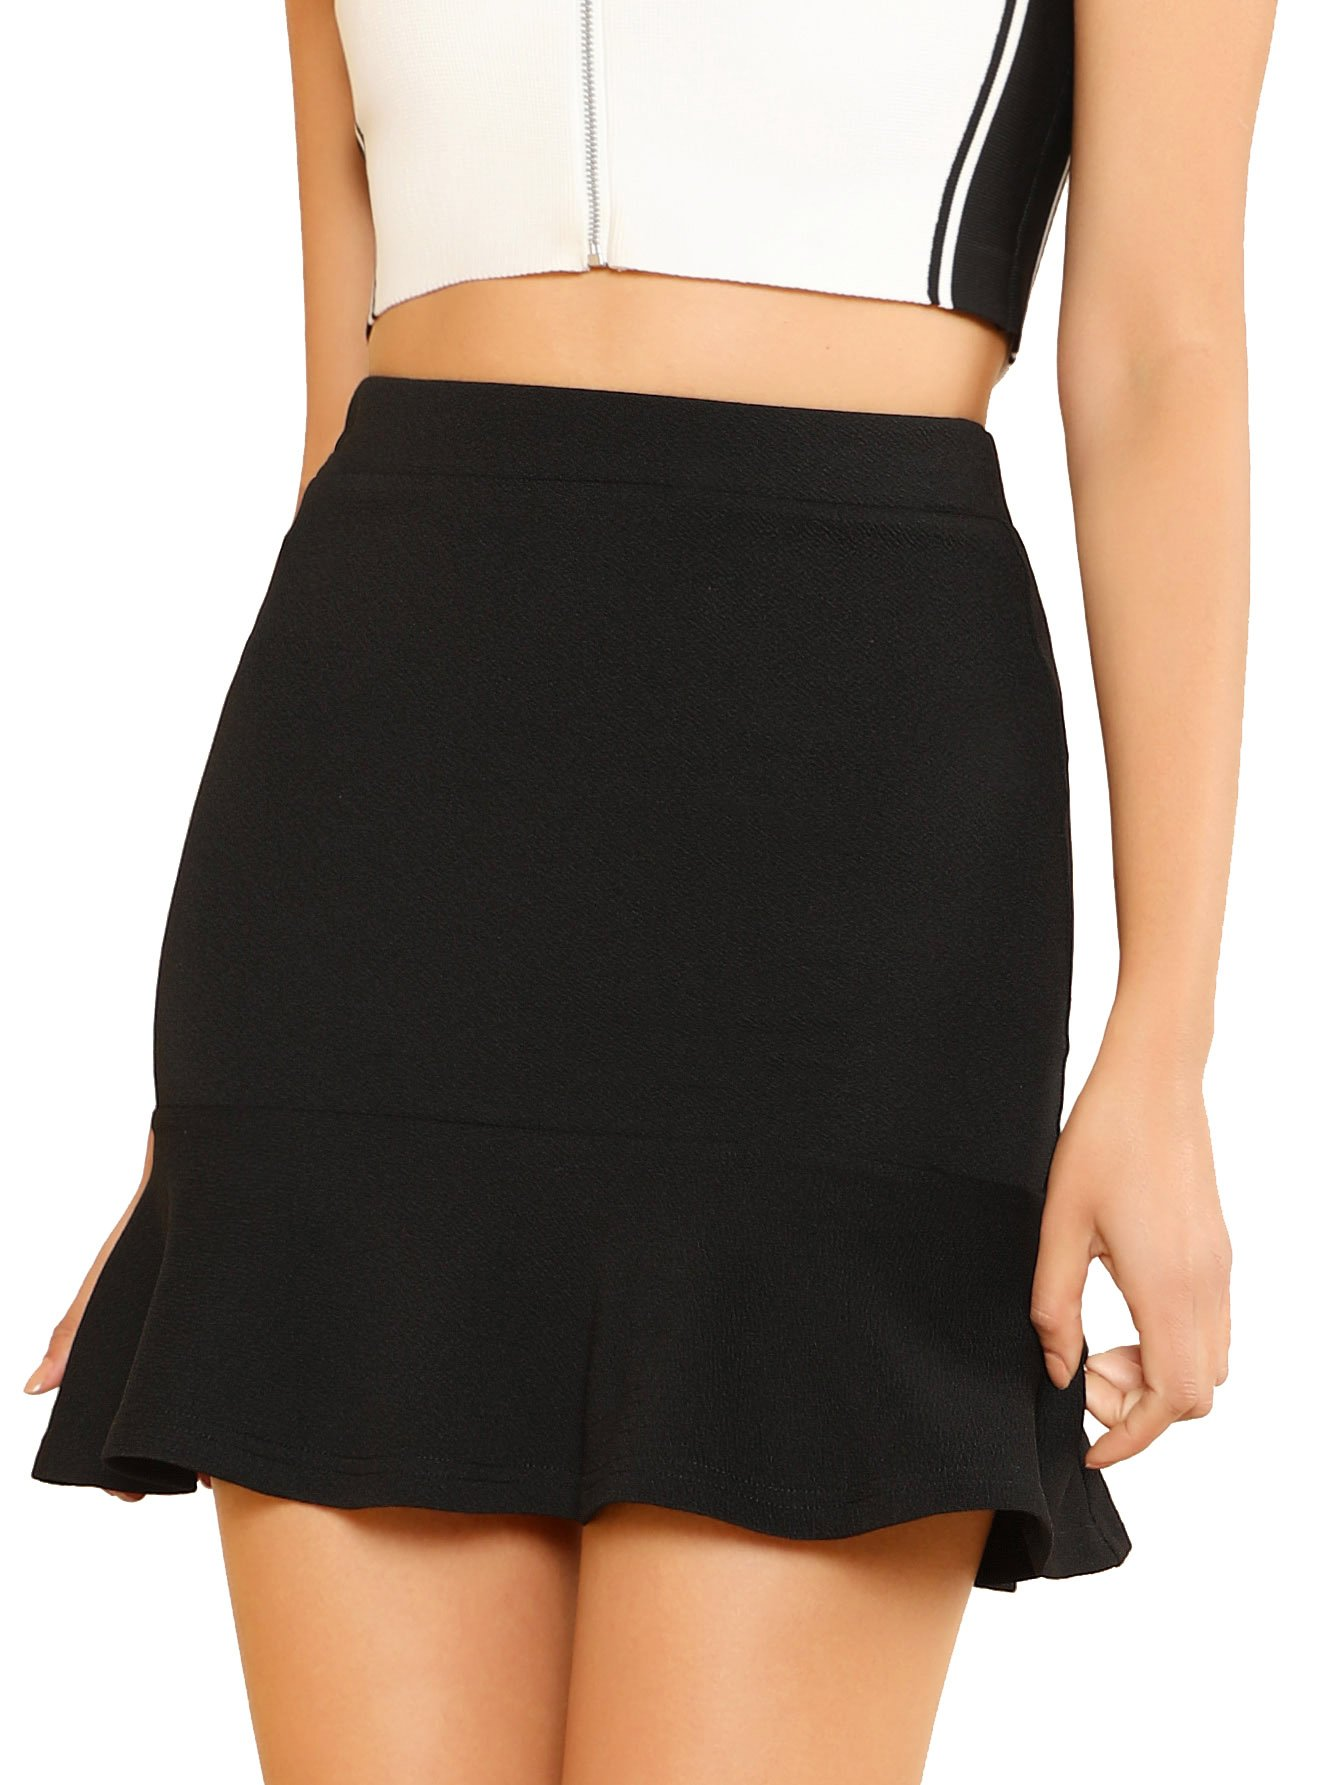 WDIRA Women's Elegant Mid Waist Above Knee Ruffle Hem Casual Skirt Black L